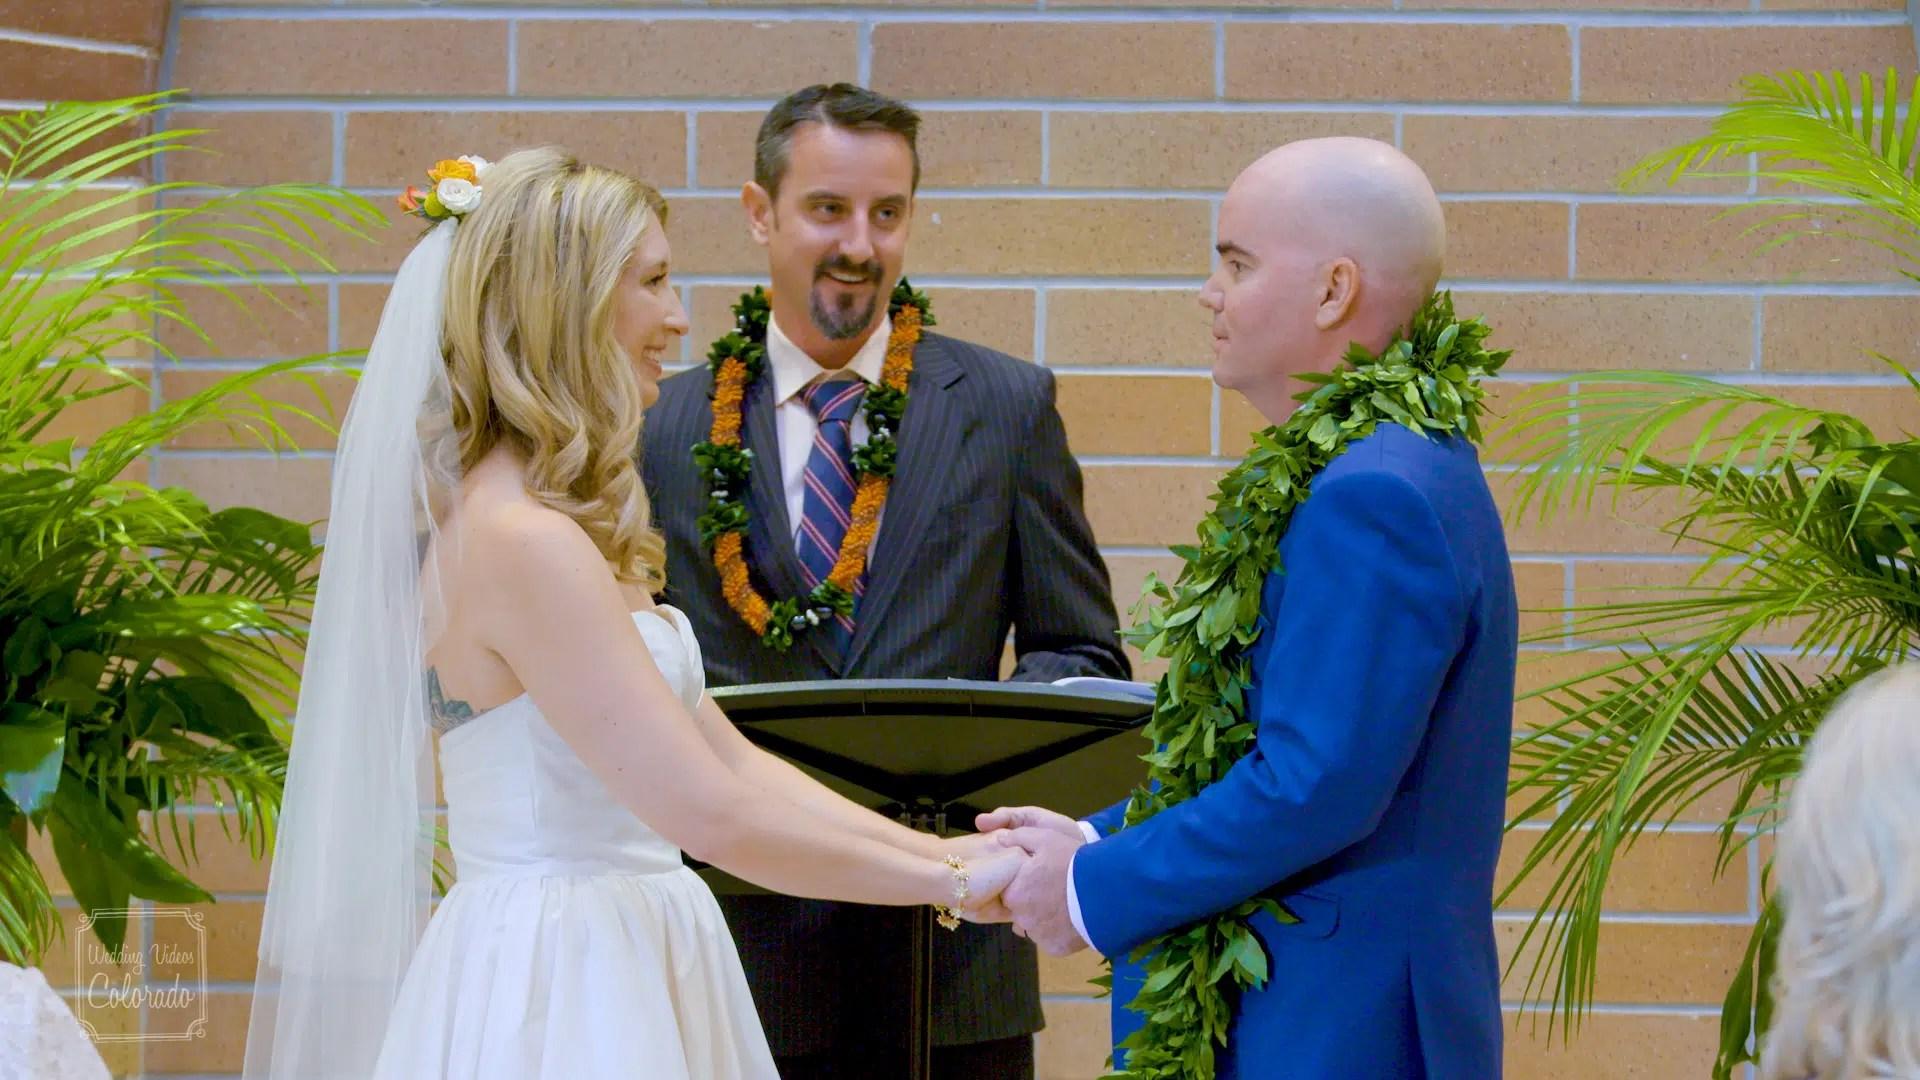 University of Denver Wedding Video